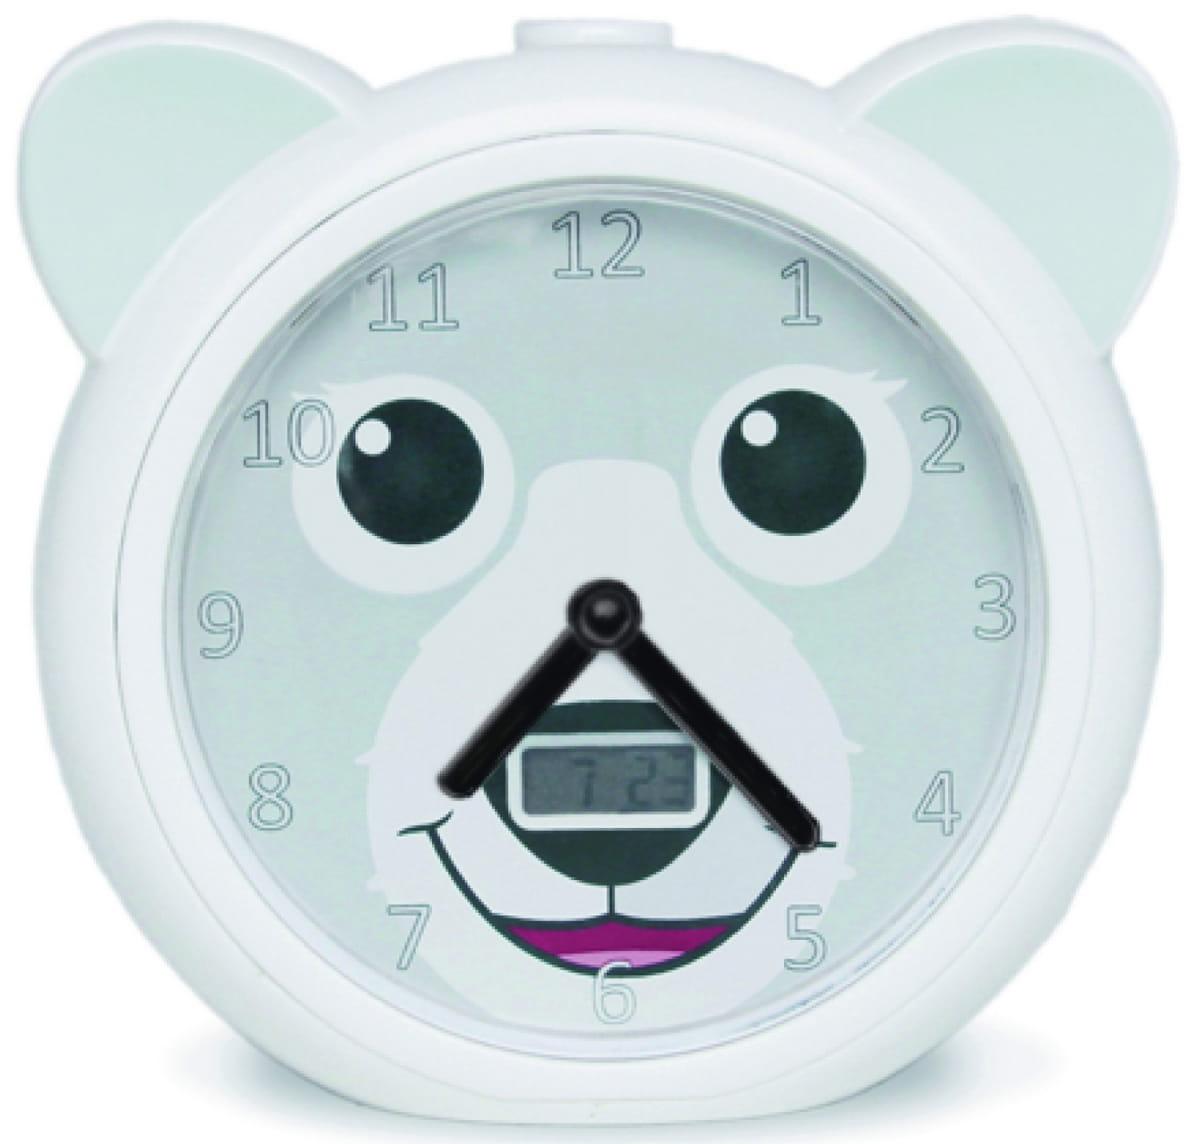 Часы-будильник ZAZU Медвежонок Бобби  белый - Электроника для детей